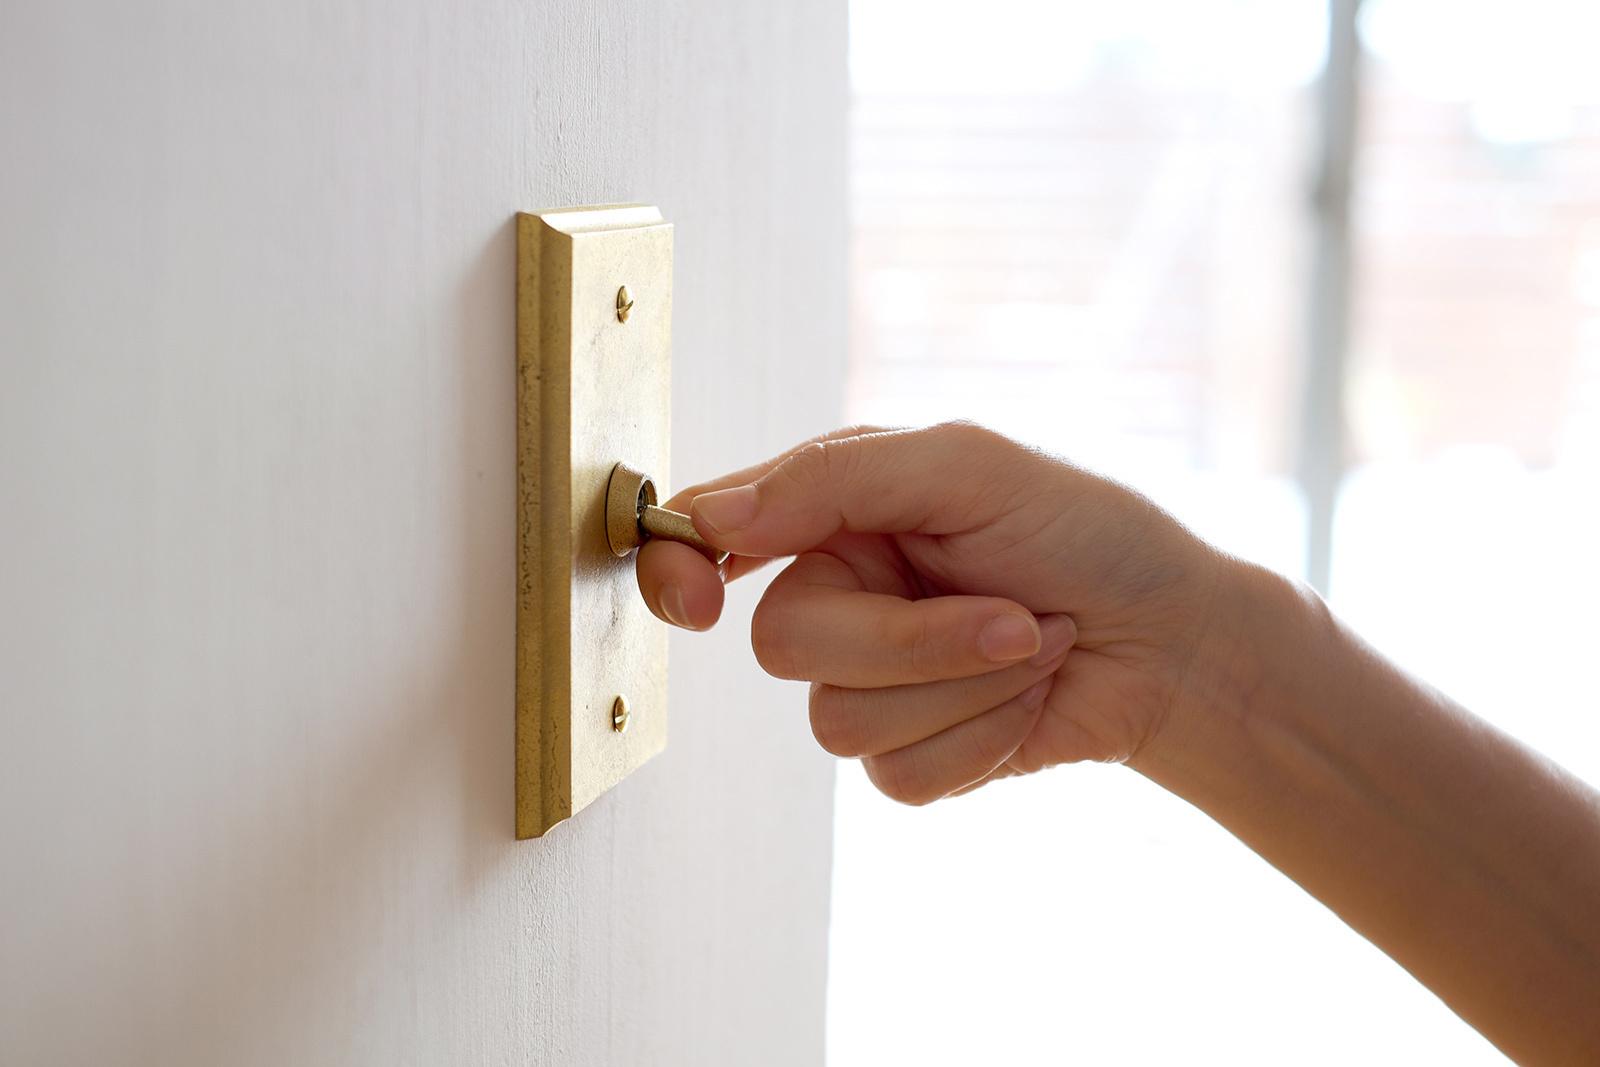 large_switch-plate-brass-japanese-design-minimalist-home-interior-nalata-nalata